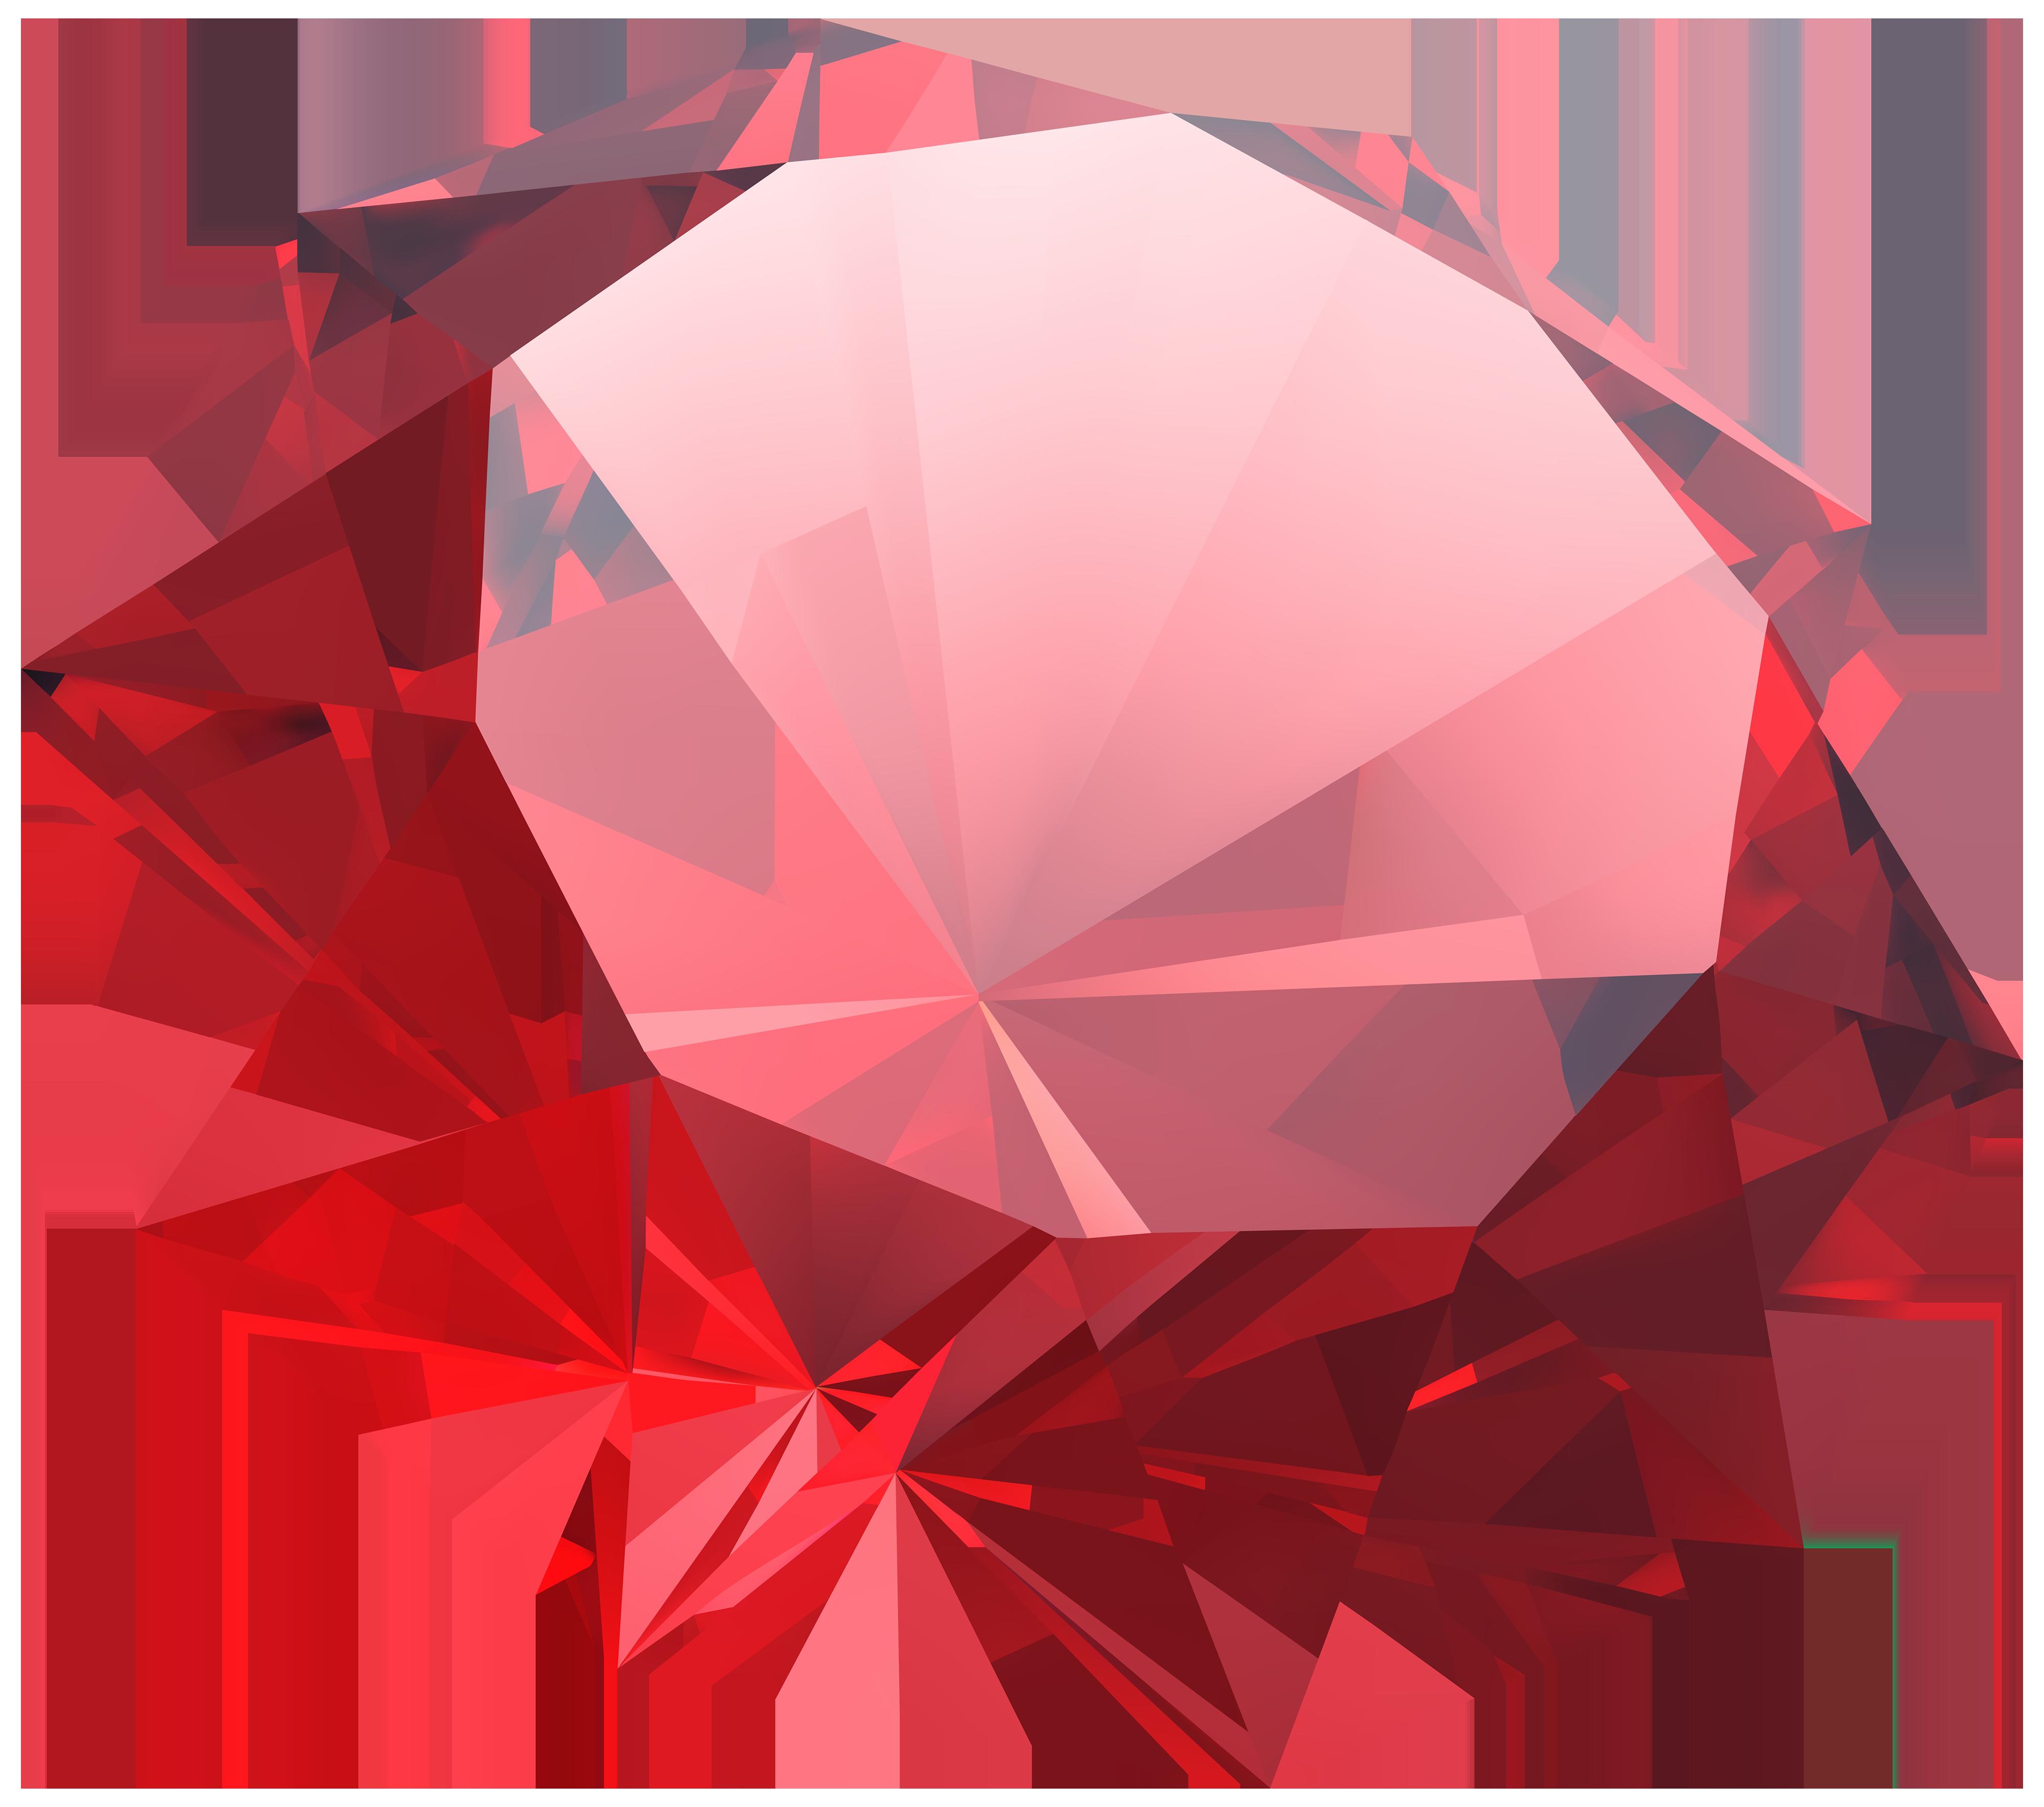 Diamond clipart red diamond Clipart Best WEB Diamond Clipart